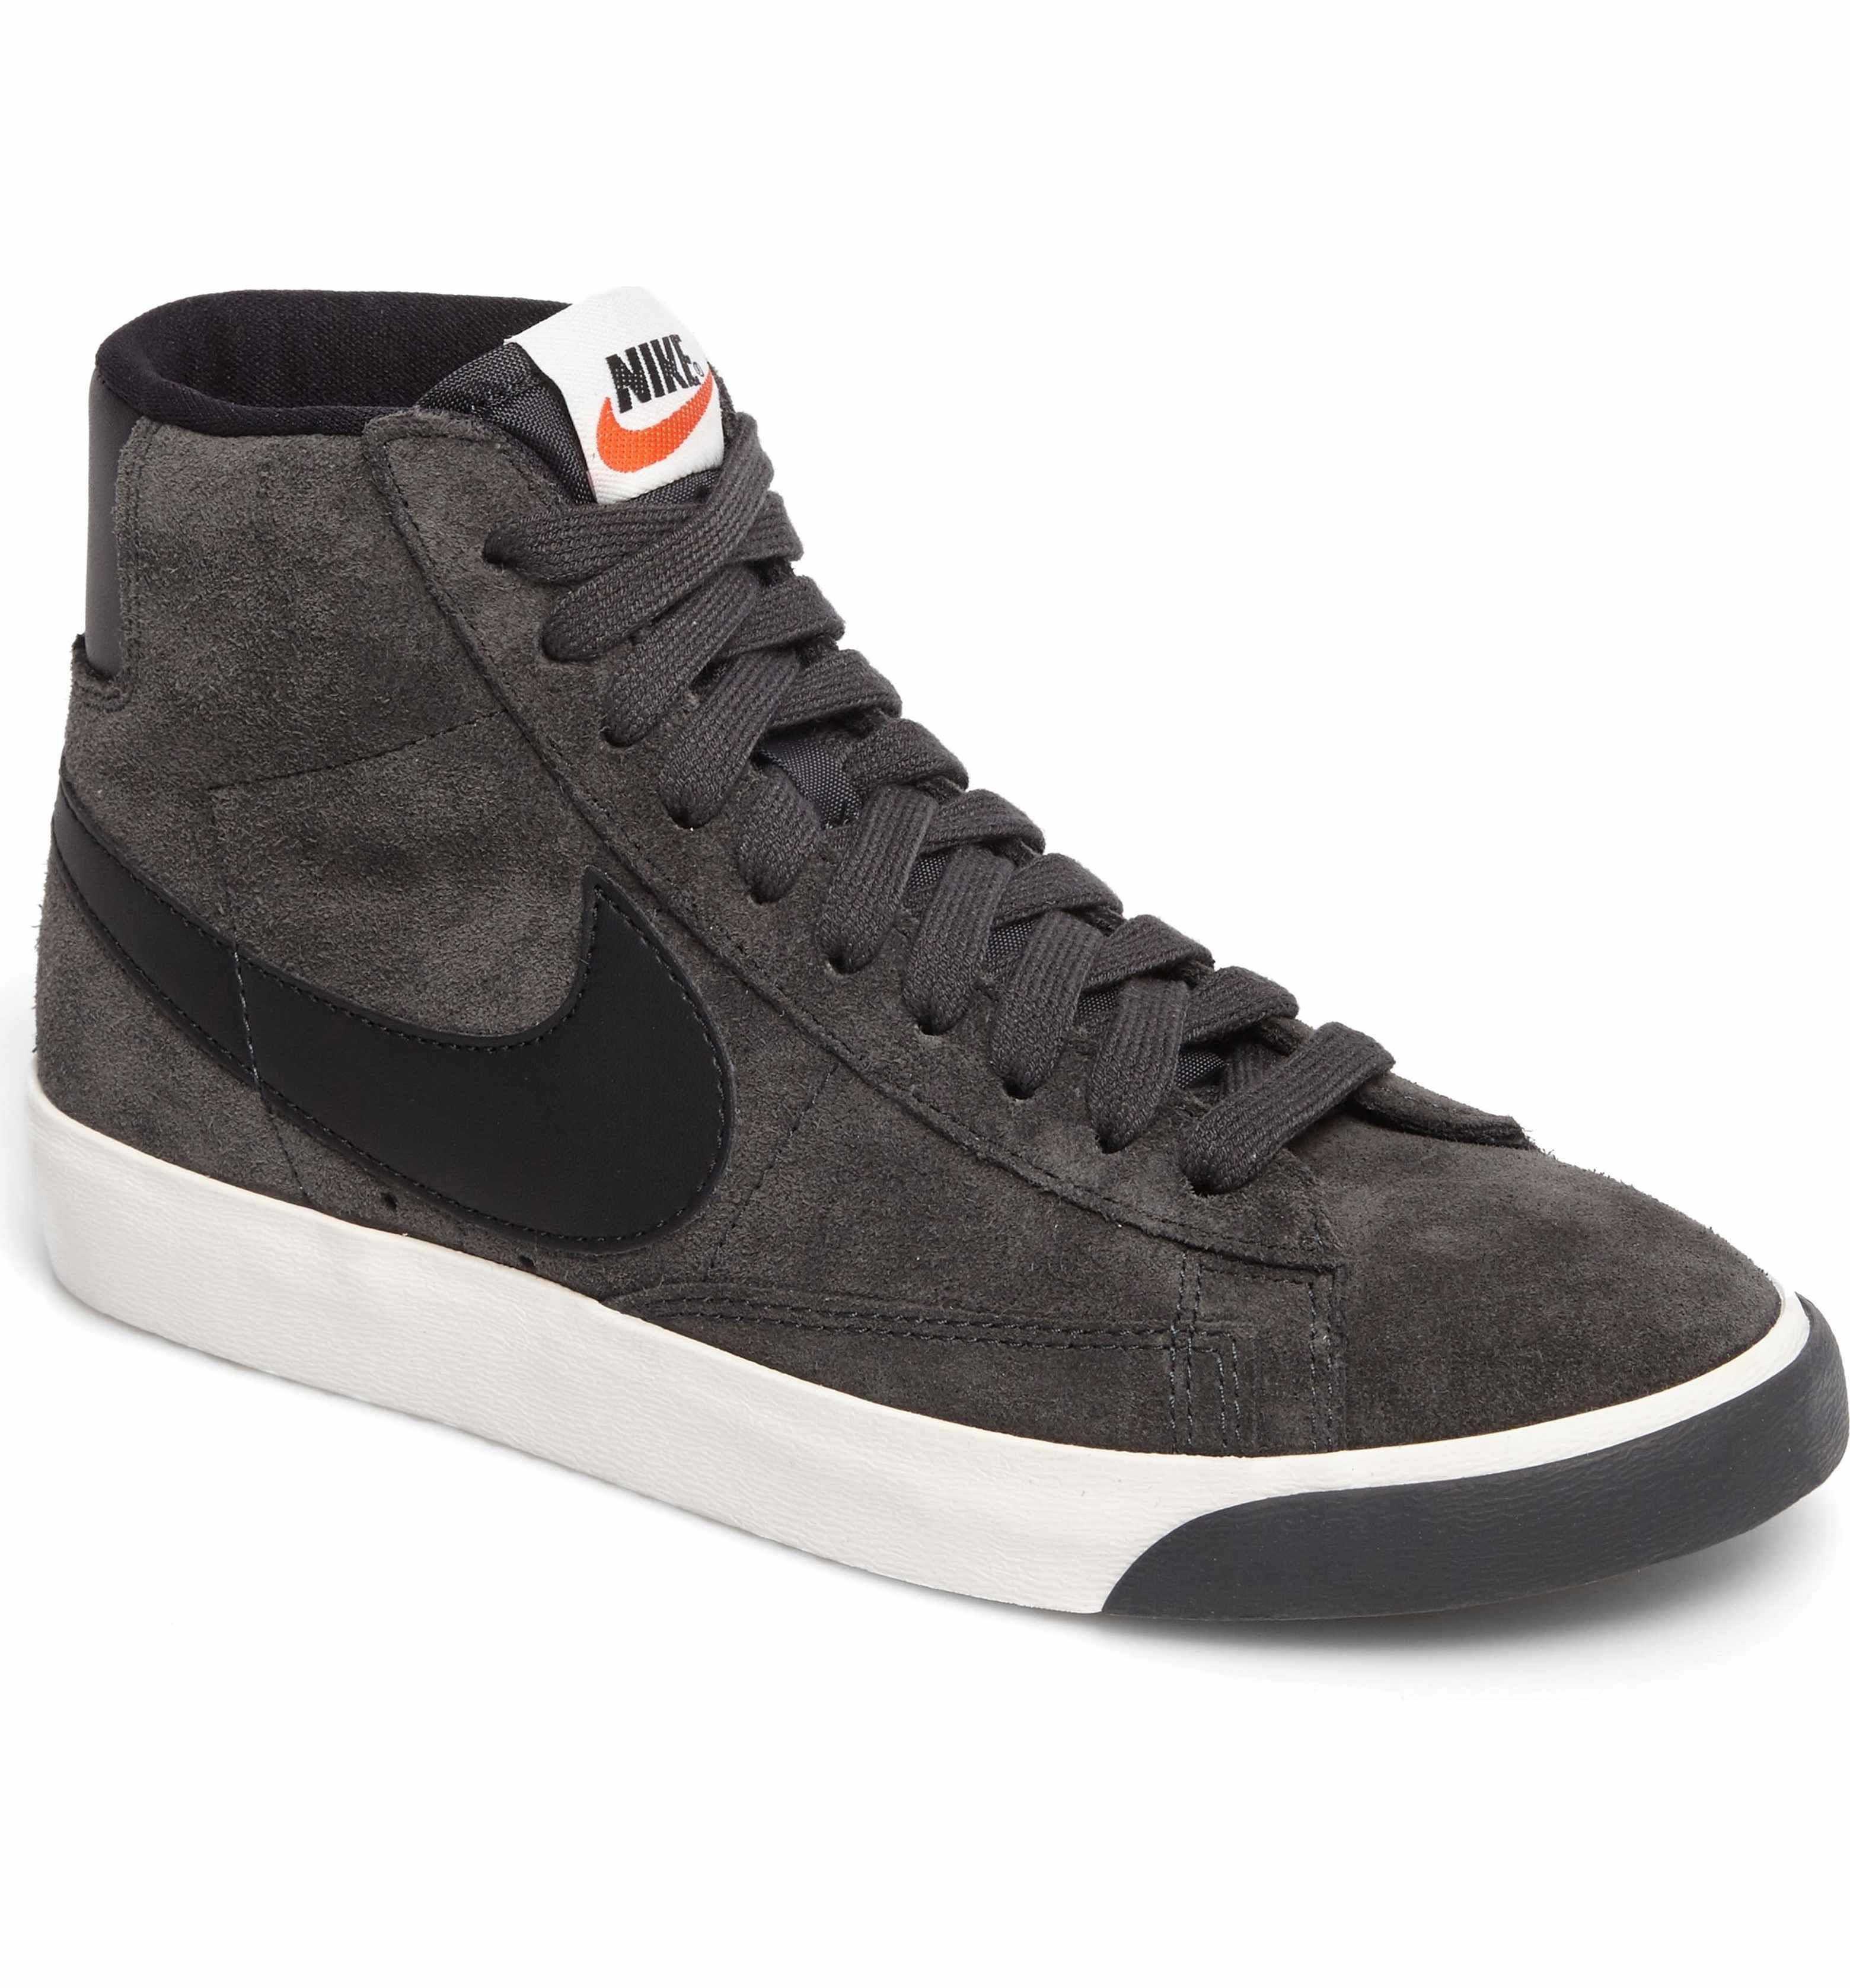 6291fdaf6930b ... mid vintage sneakers. vintage sneakersnike blazerssneakers  womenbasketball cc2ca 12d7f coupon code nike blazer mid suede vintage w  shoes grey women ...